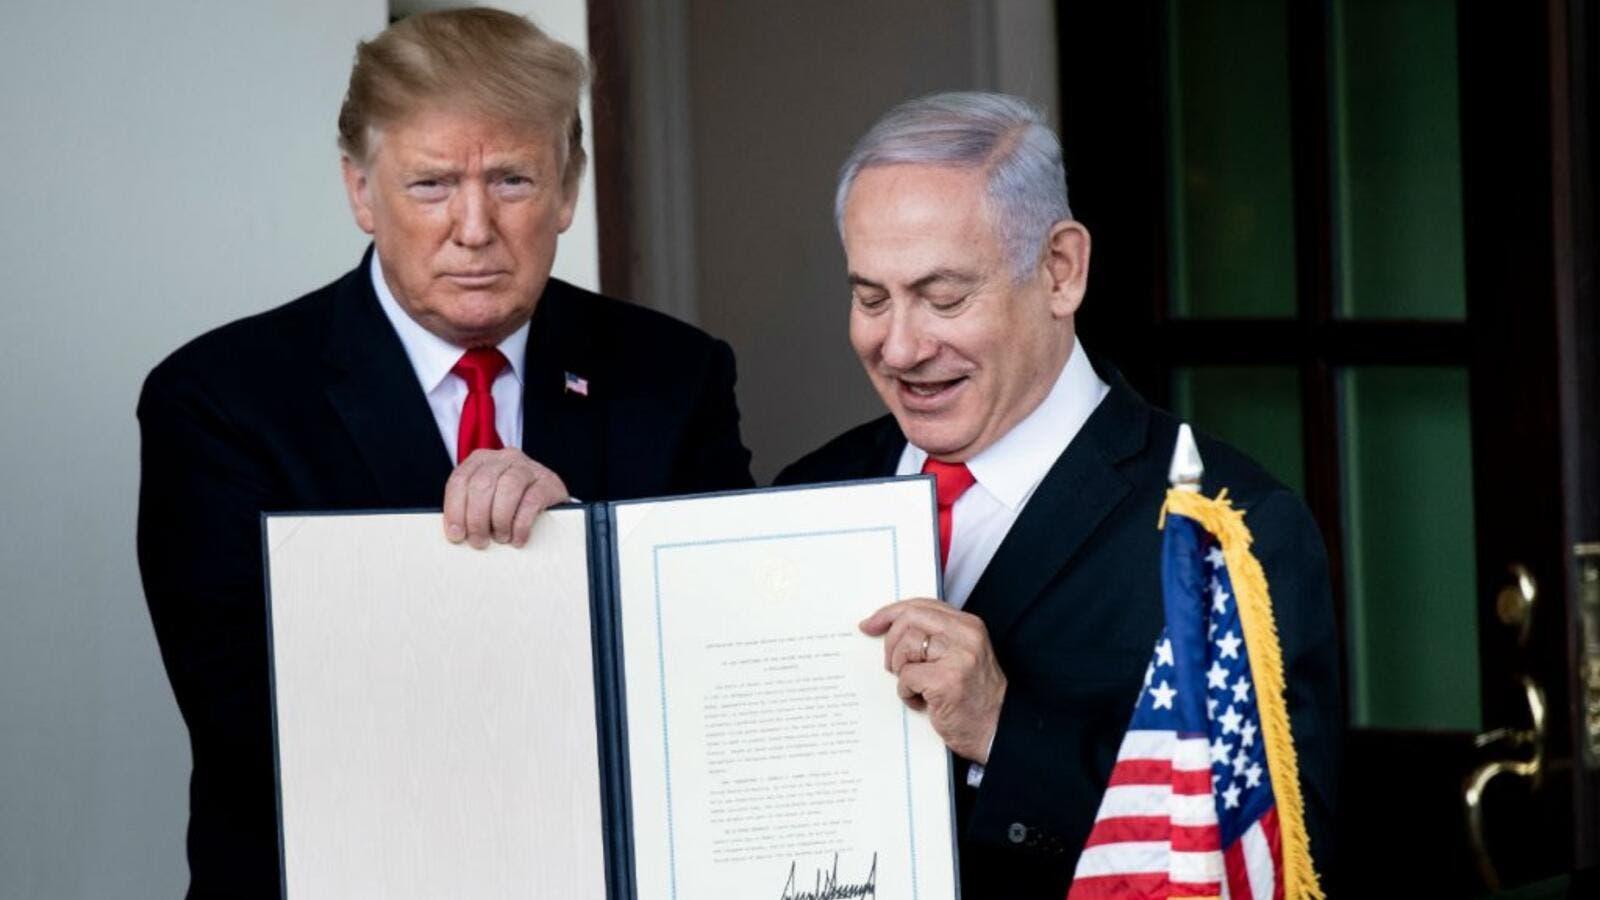 Likud MK condemns attack by Sanders on Netanyahu